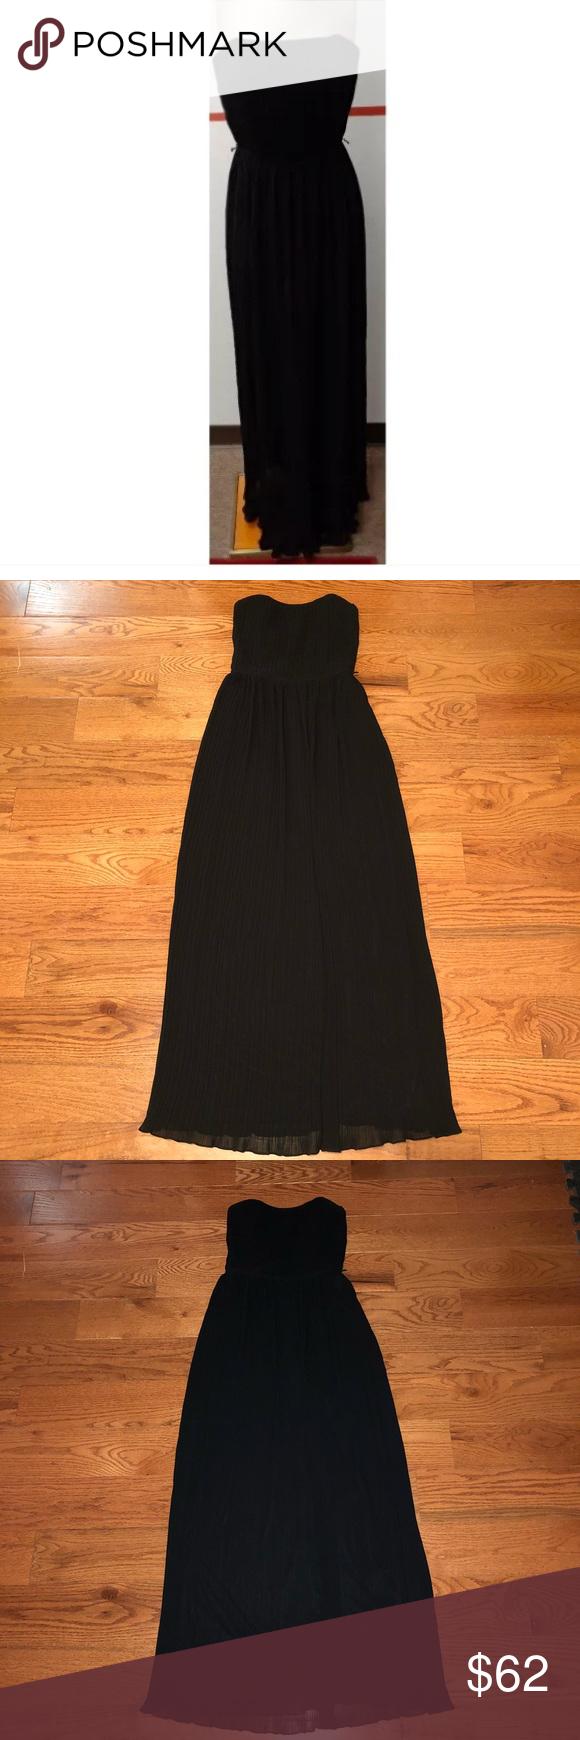 Dessy collection black strapless pleated dress diamond dress